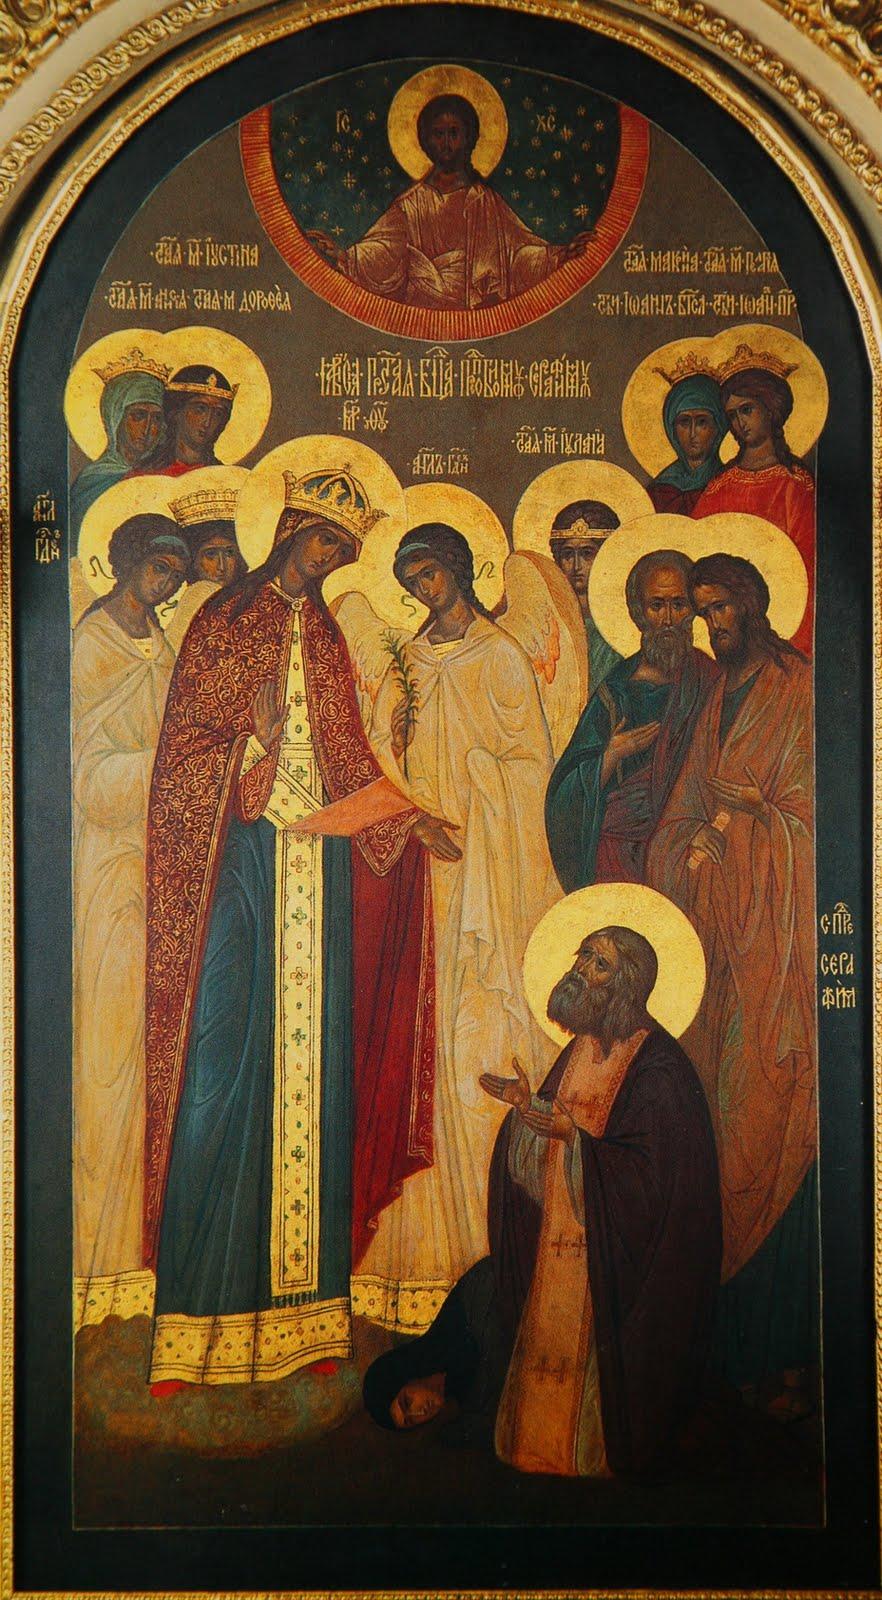 Reverend Seraphim of Sarov - the patron of what